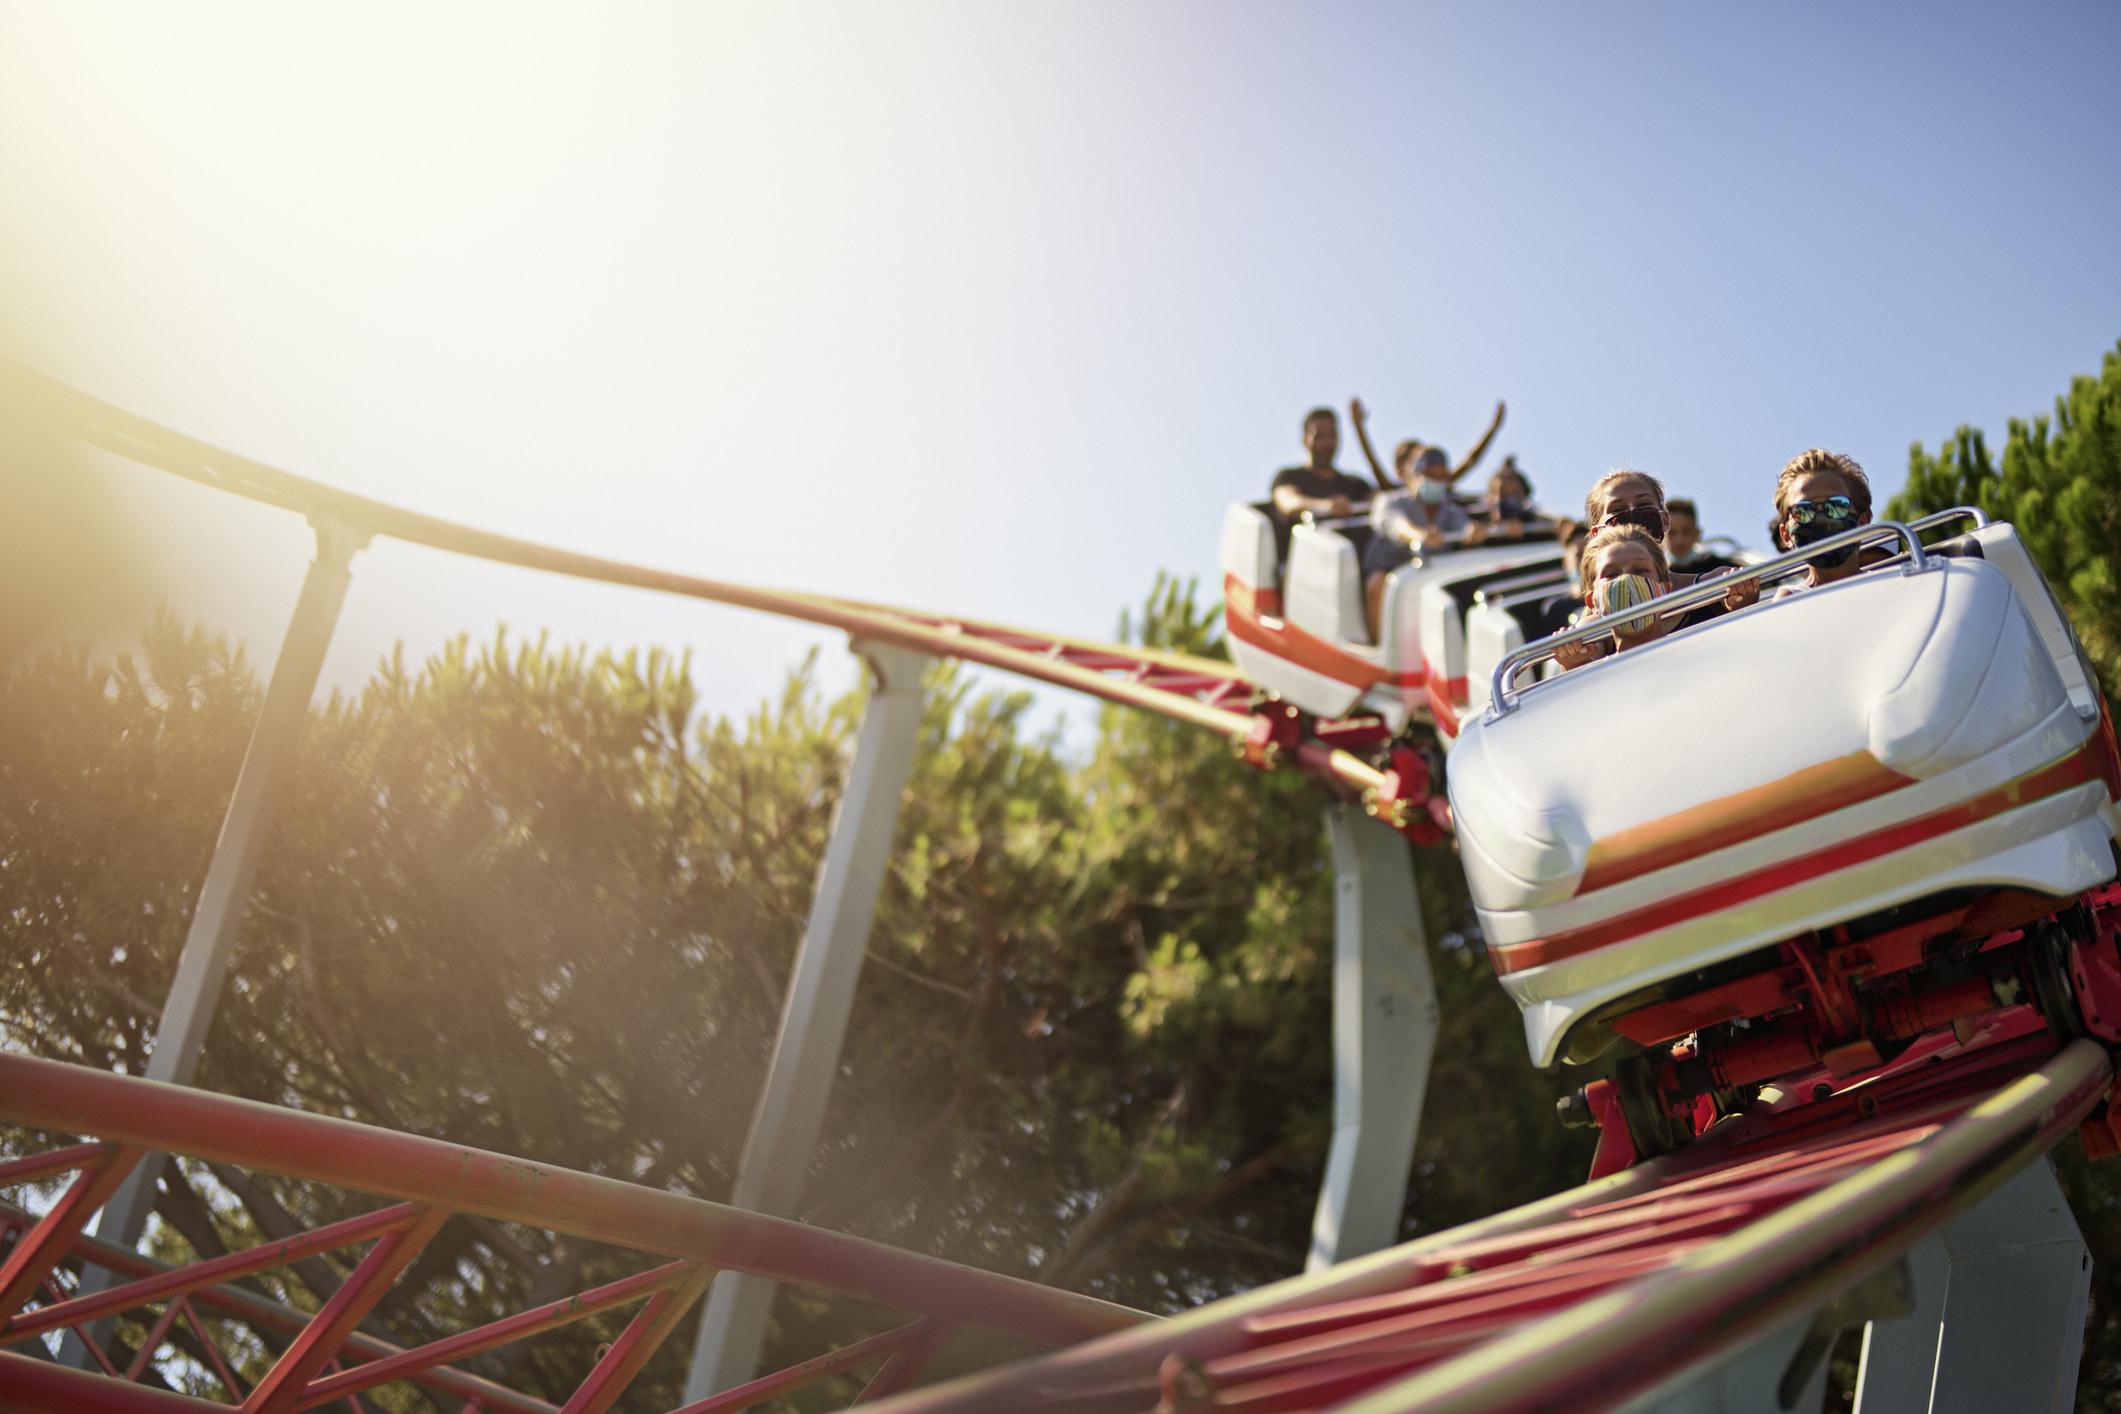 A roller coaster at a theme park